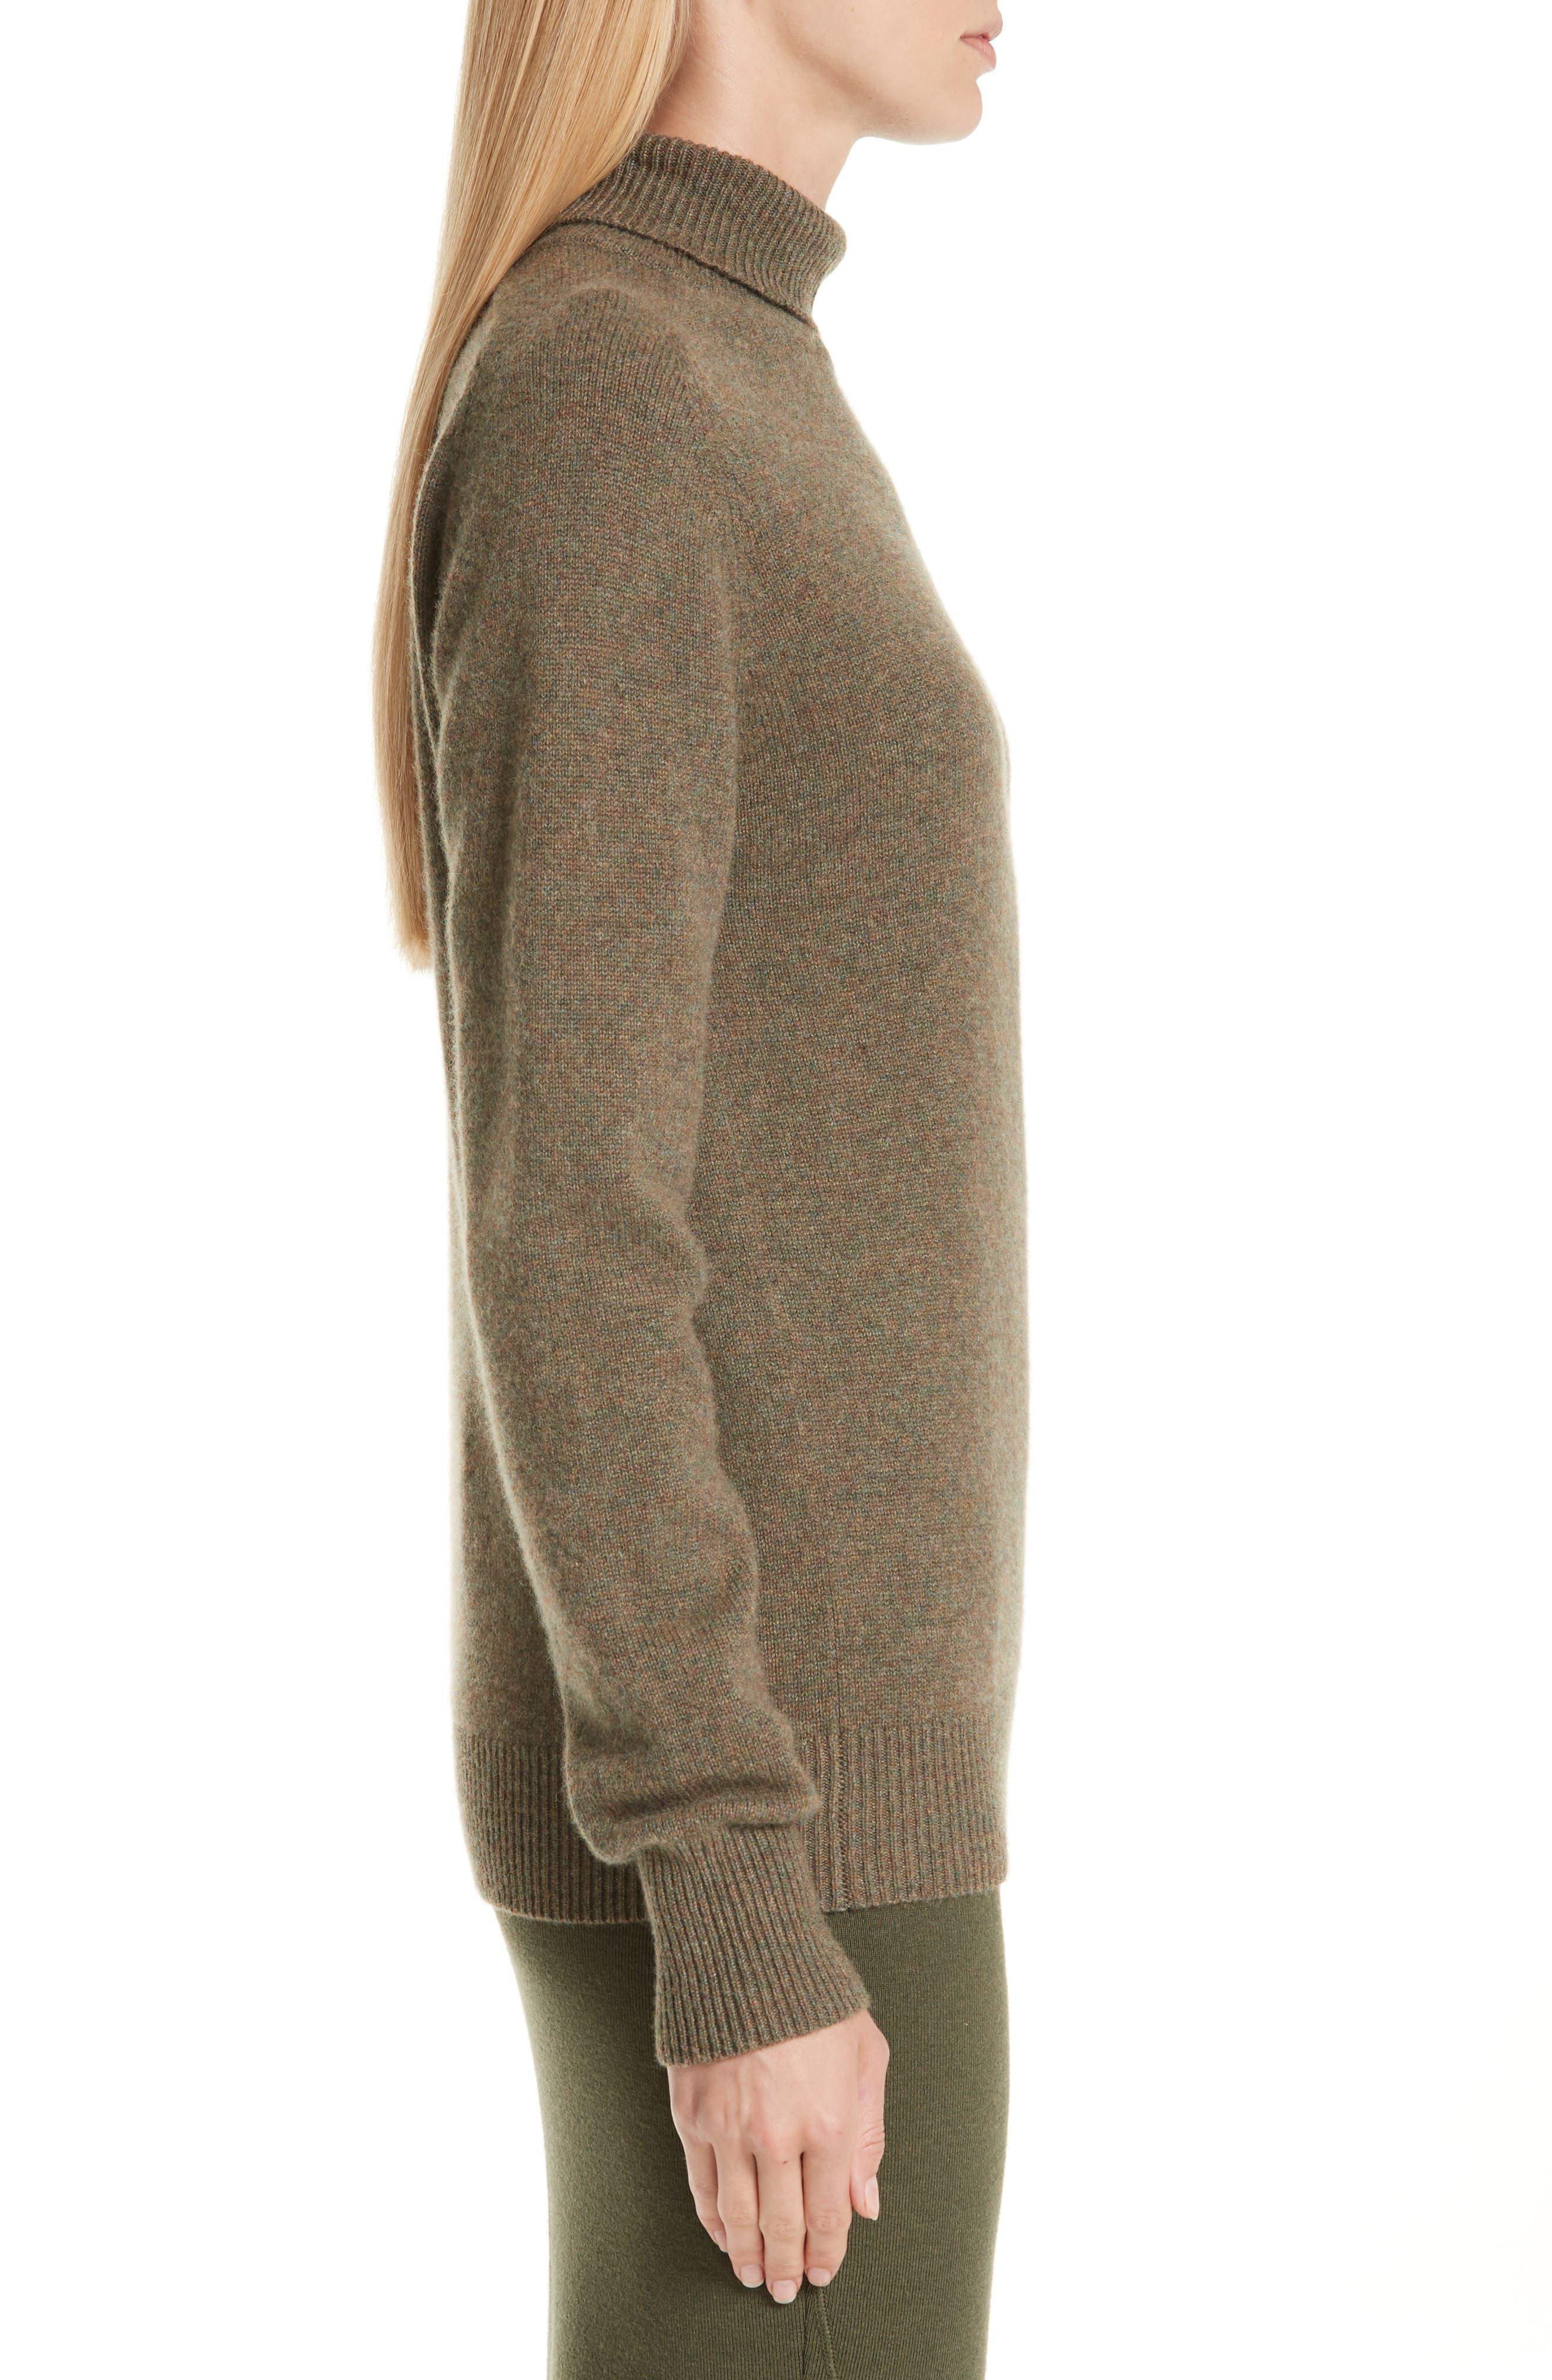 VICTORIA BECKHAM, Stretch Cashmere Turtleneck Sweater, Alternate thumbnail 4, color, OLIVE